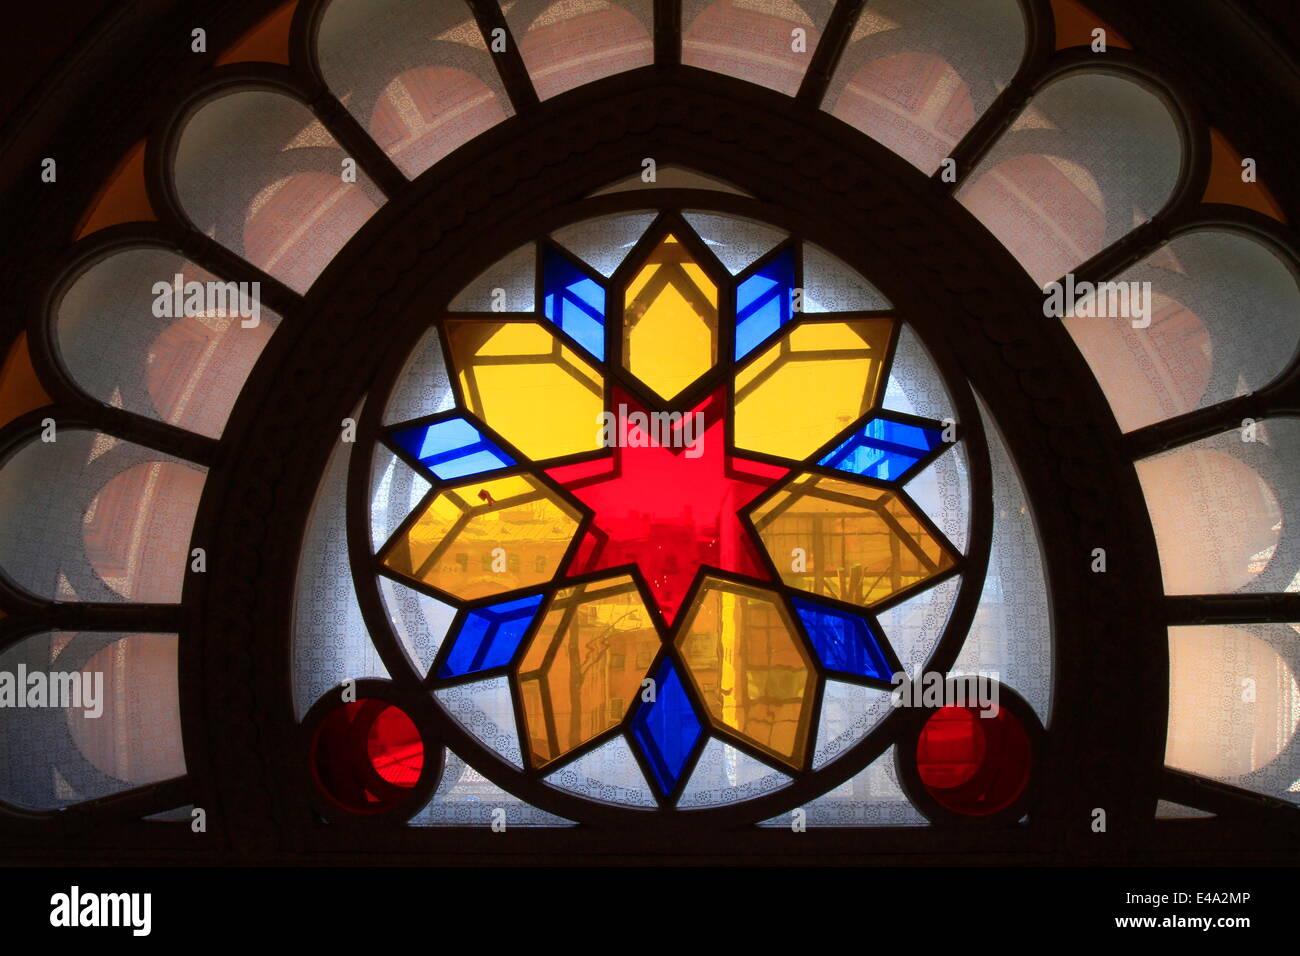 Las vidrieras, Edmond J Safra Gran Sinagoga Coral, San Petersburgo, Rusia, Europa Imagen De Stock